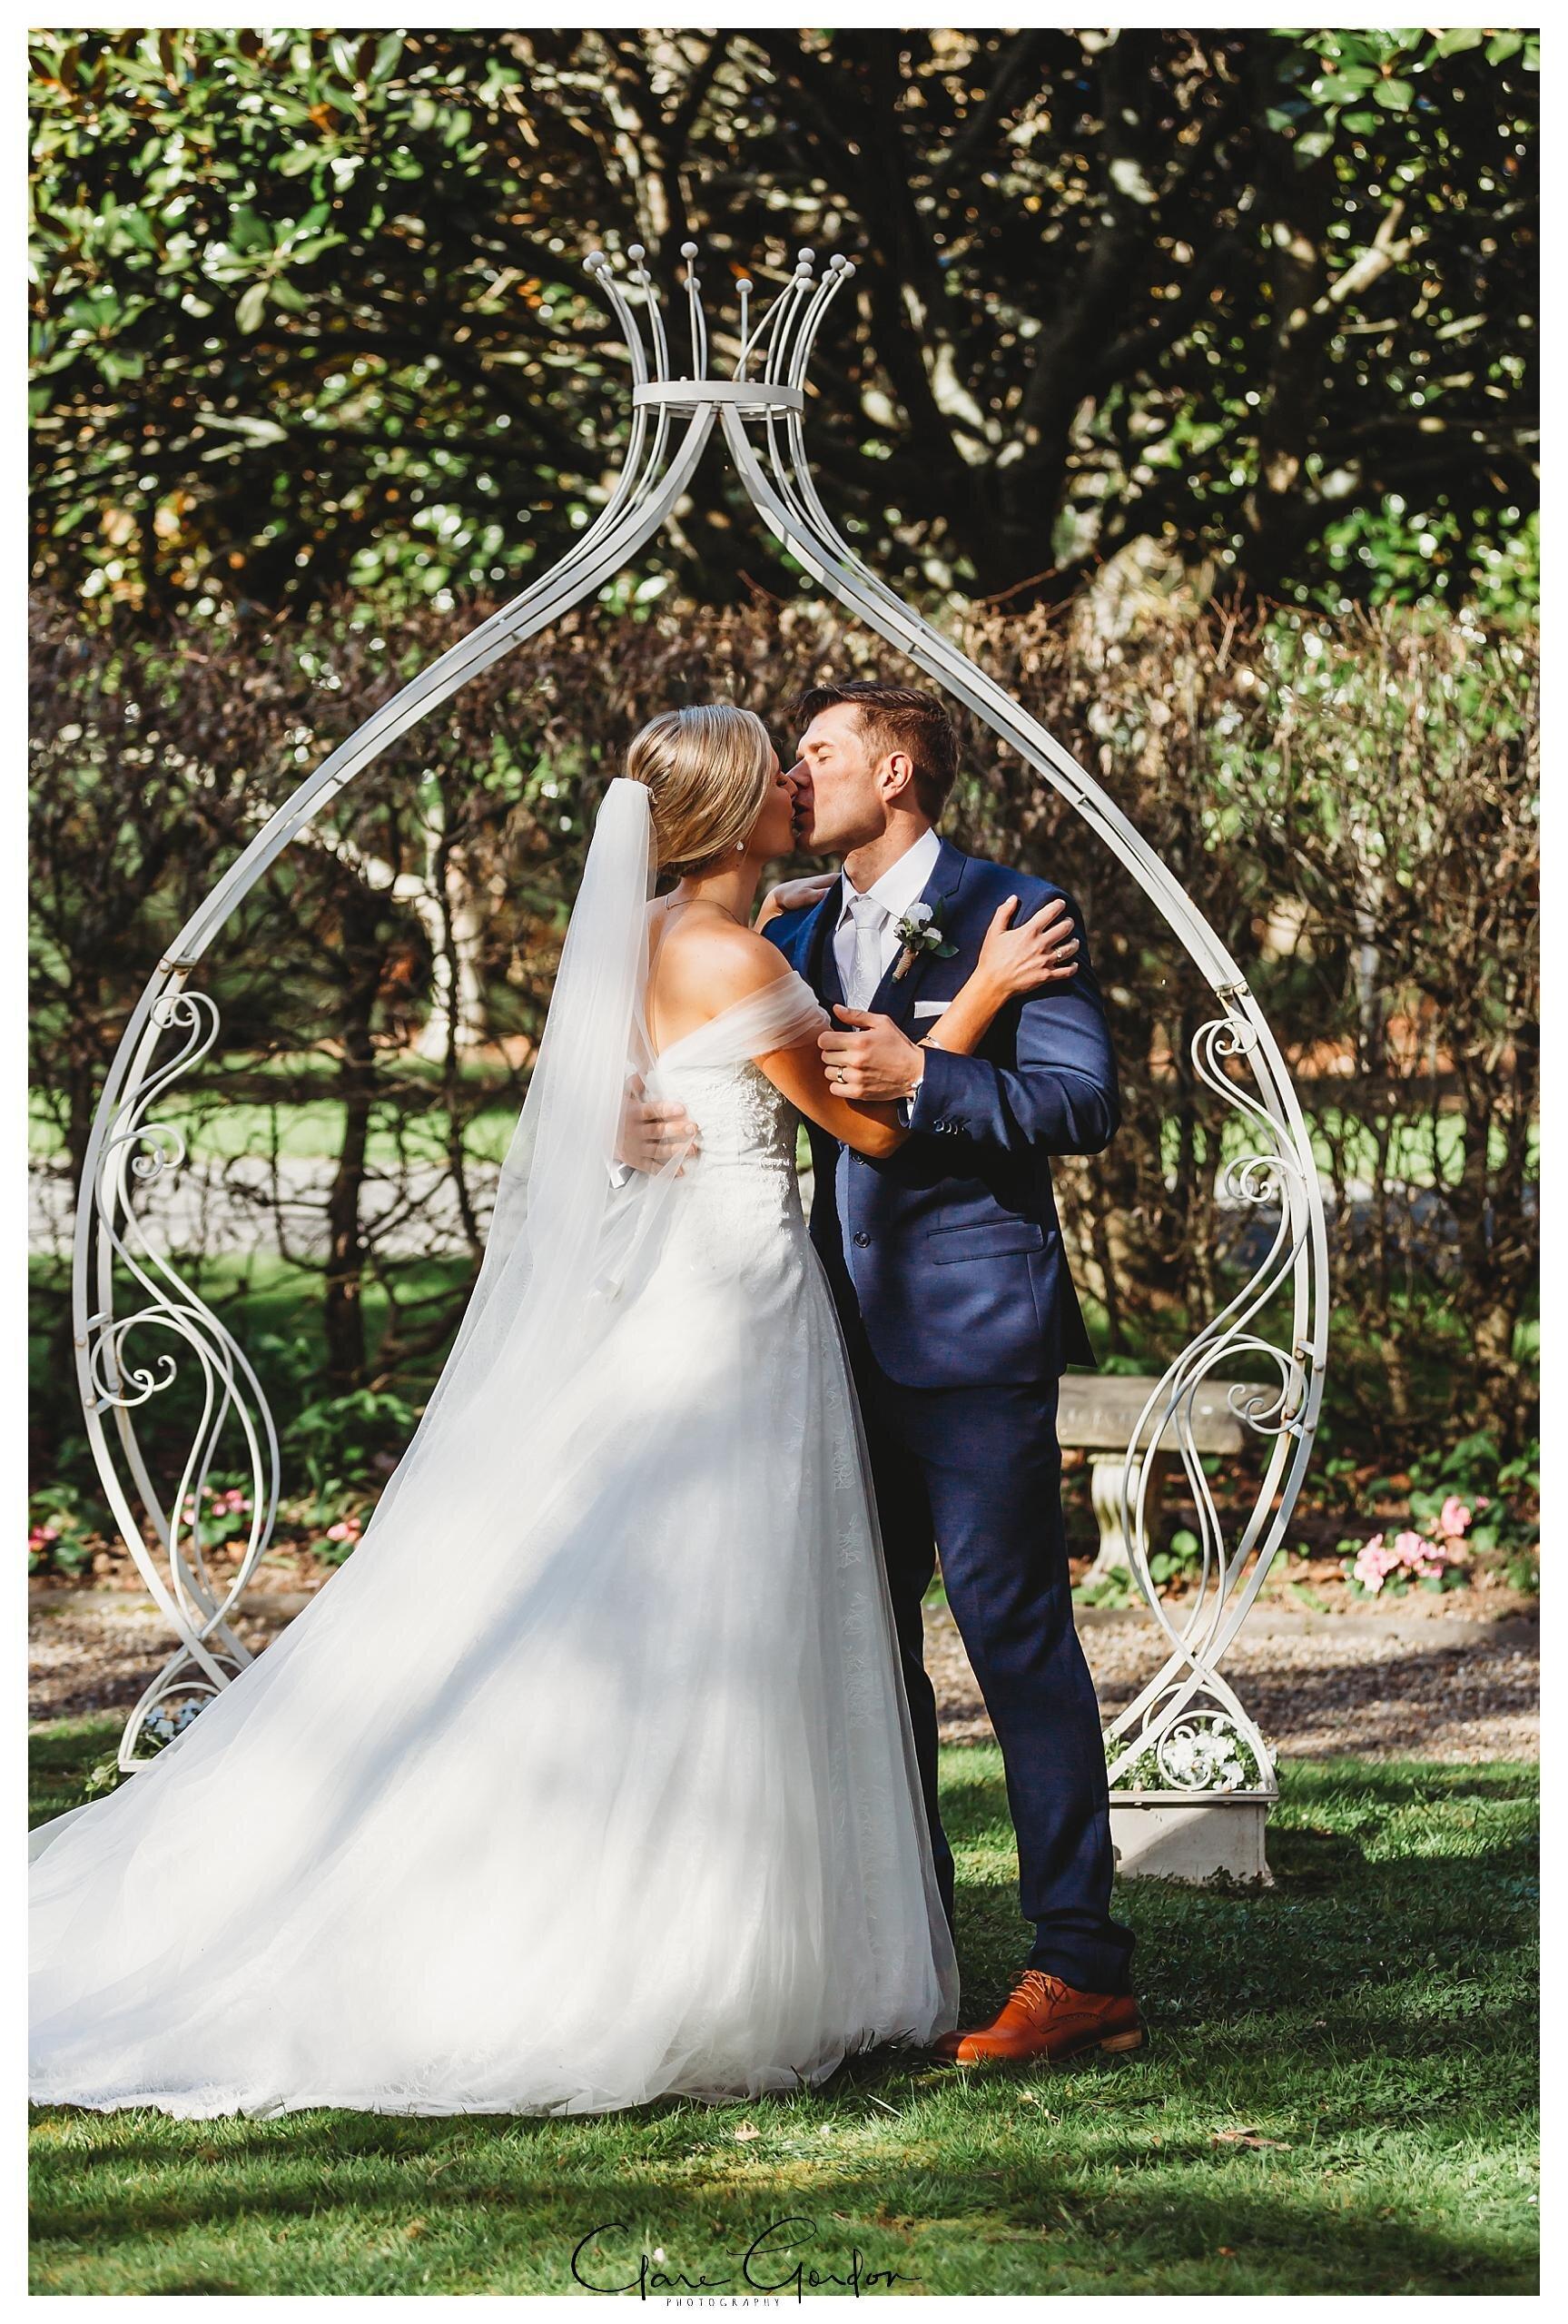 Henley-Hotel-Cherry-blossom-wedding-photos (51).jpg